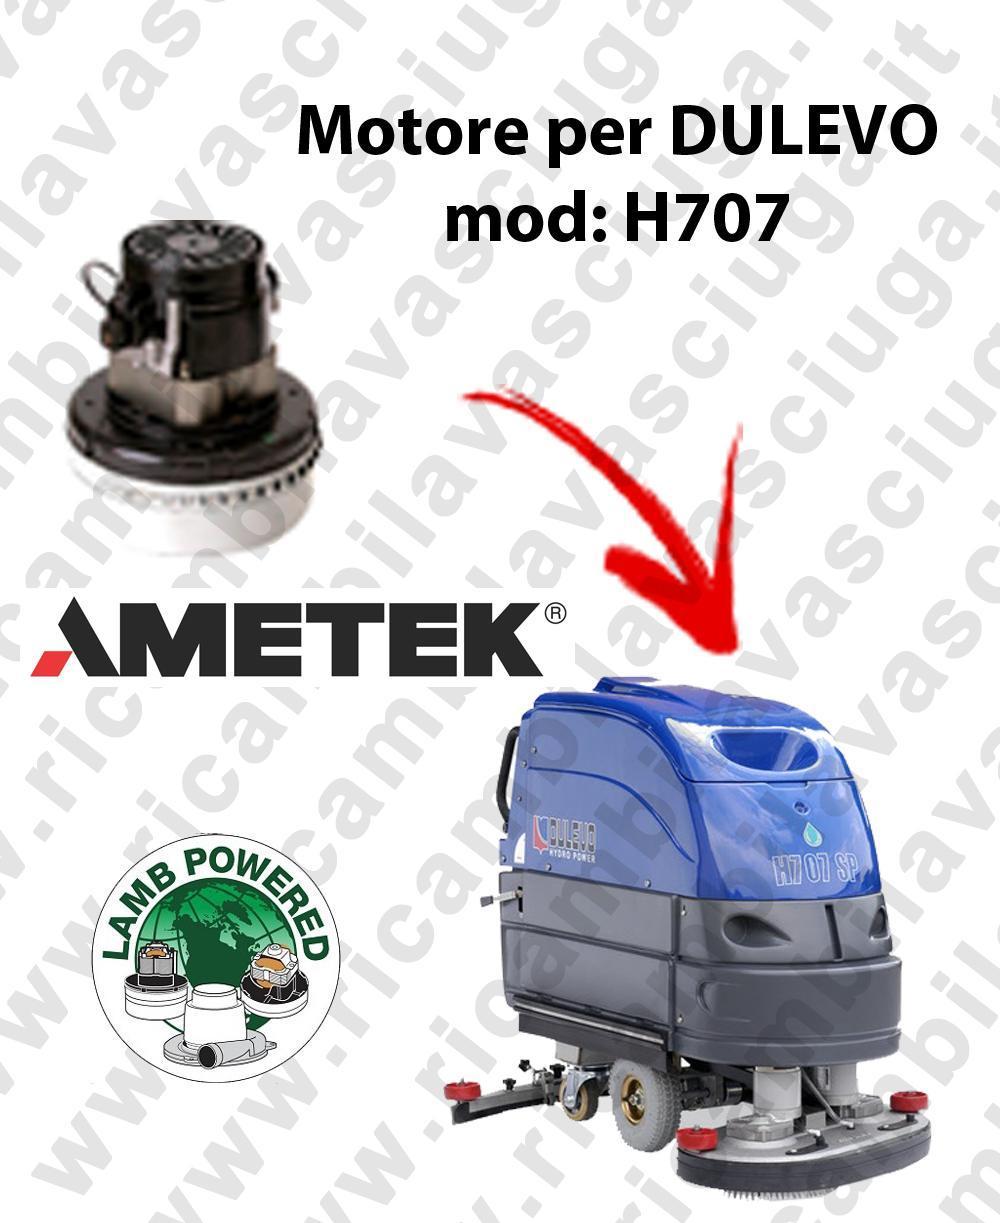 H707 Saugmotor LAMB AMETEK für scheuersaugmaschinen DULEVO